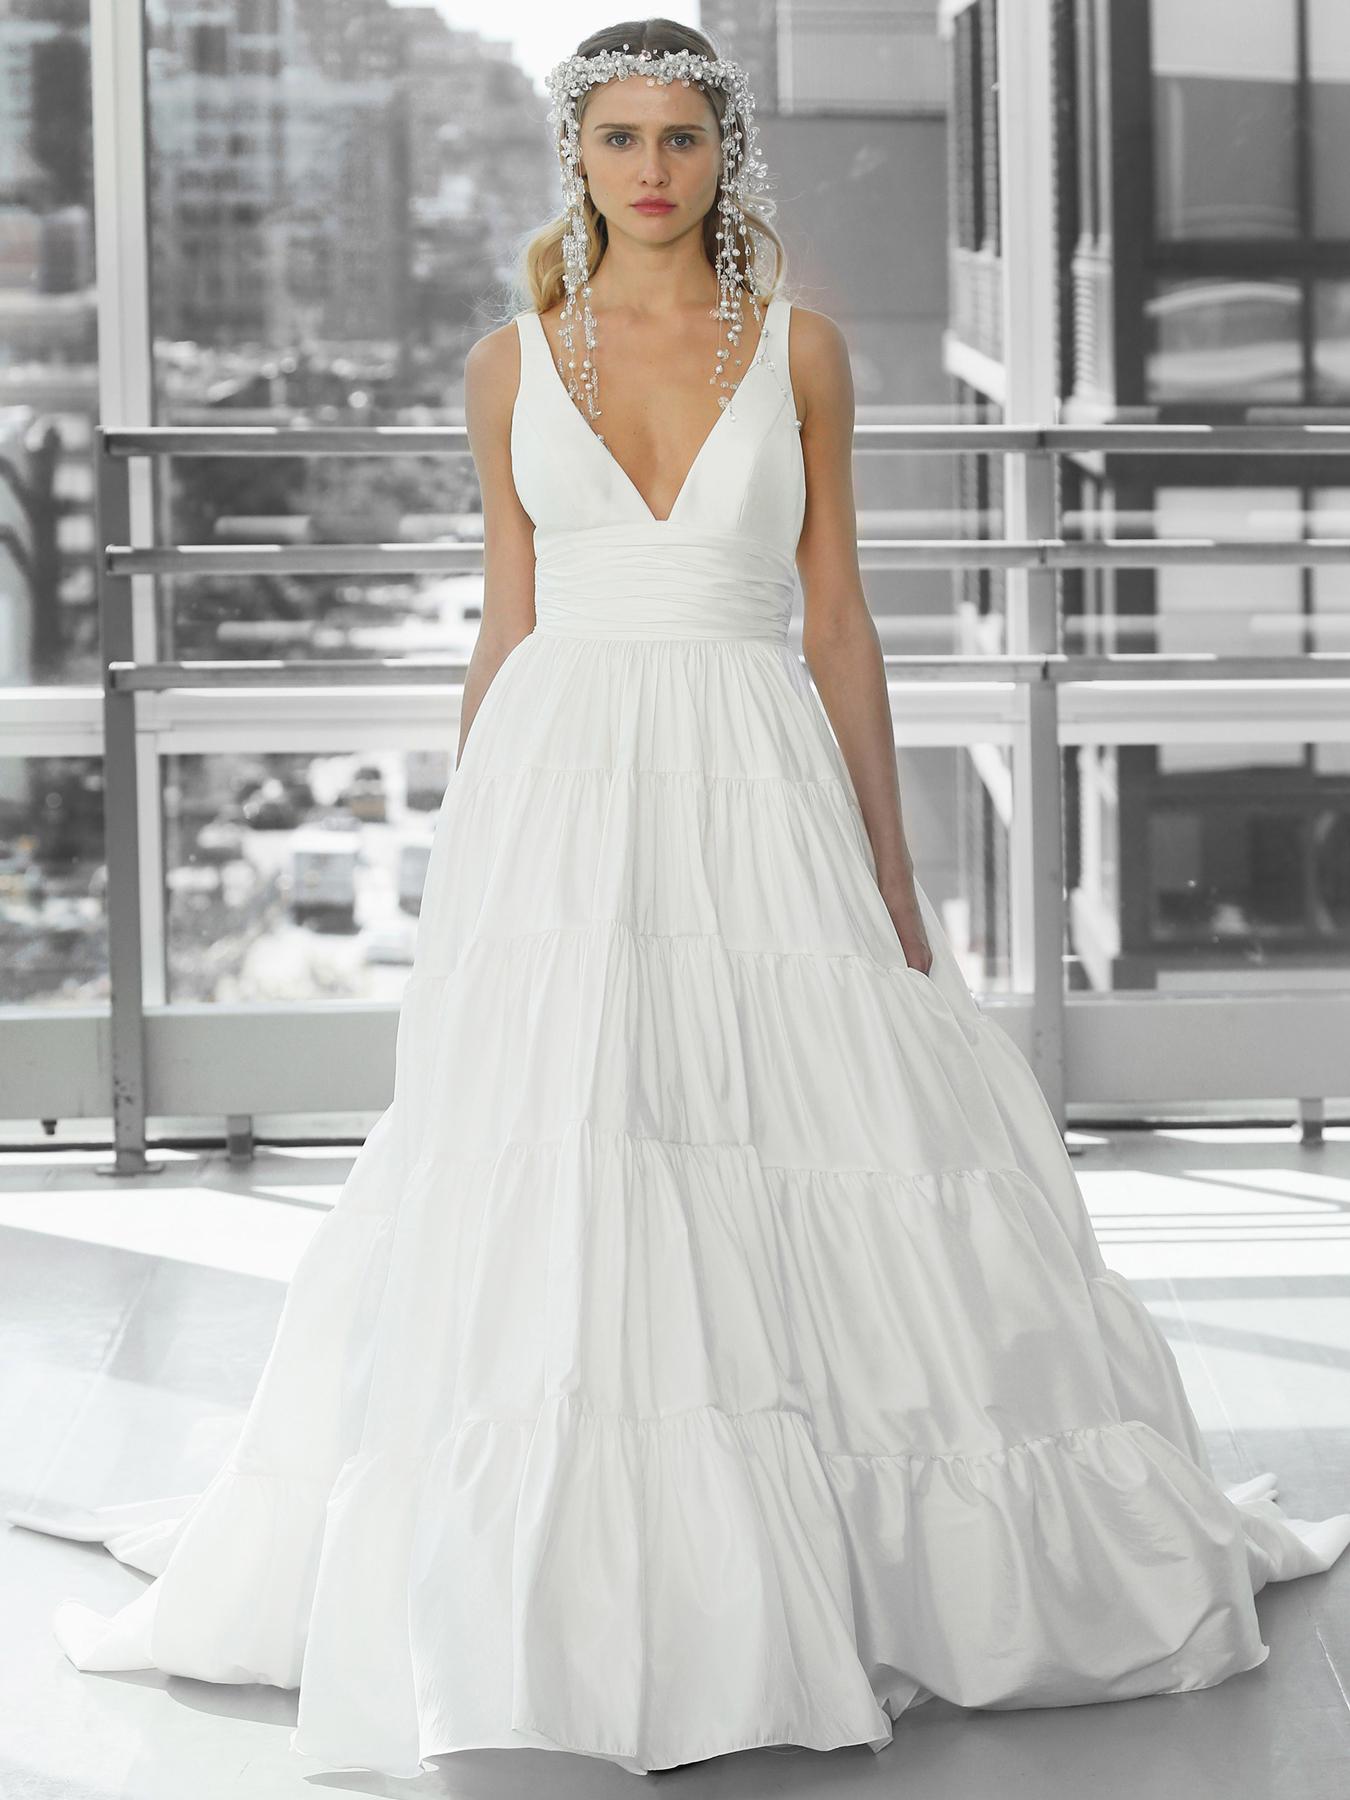 Justin Alexander Signature tine strap v-neck ball gown wedding dress fall 2020